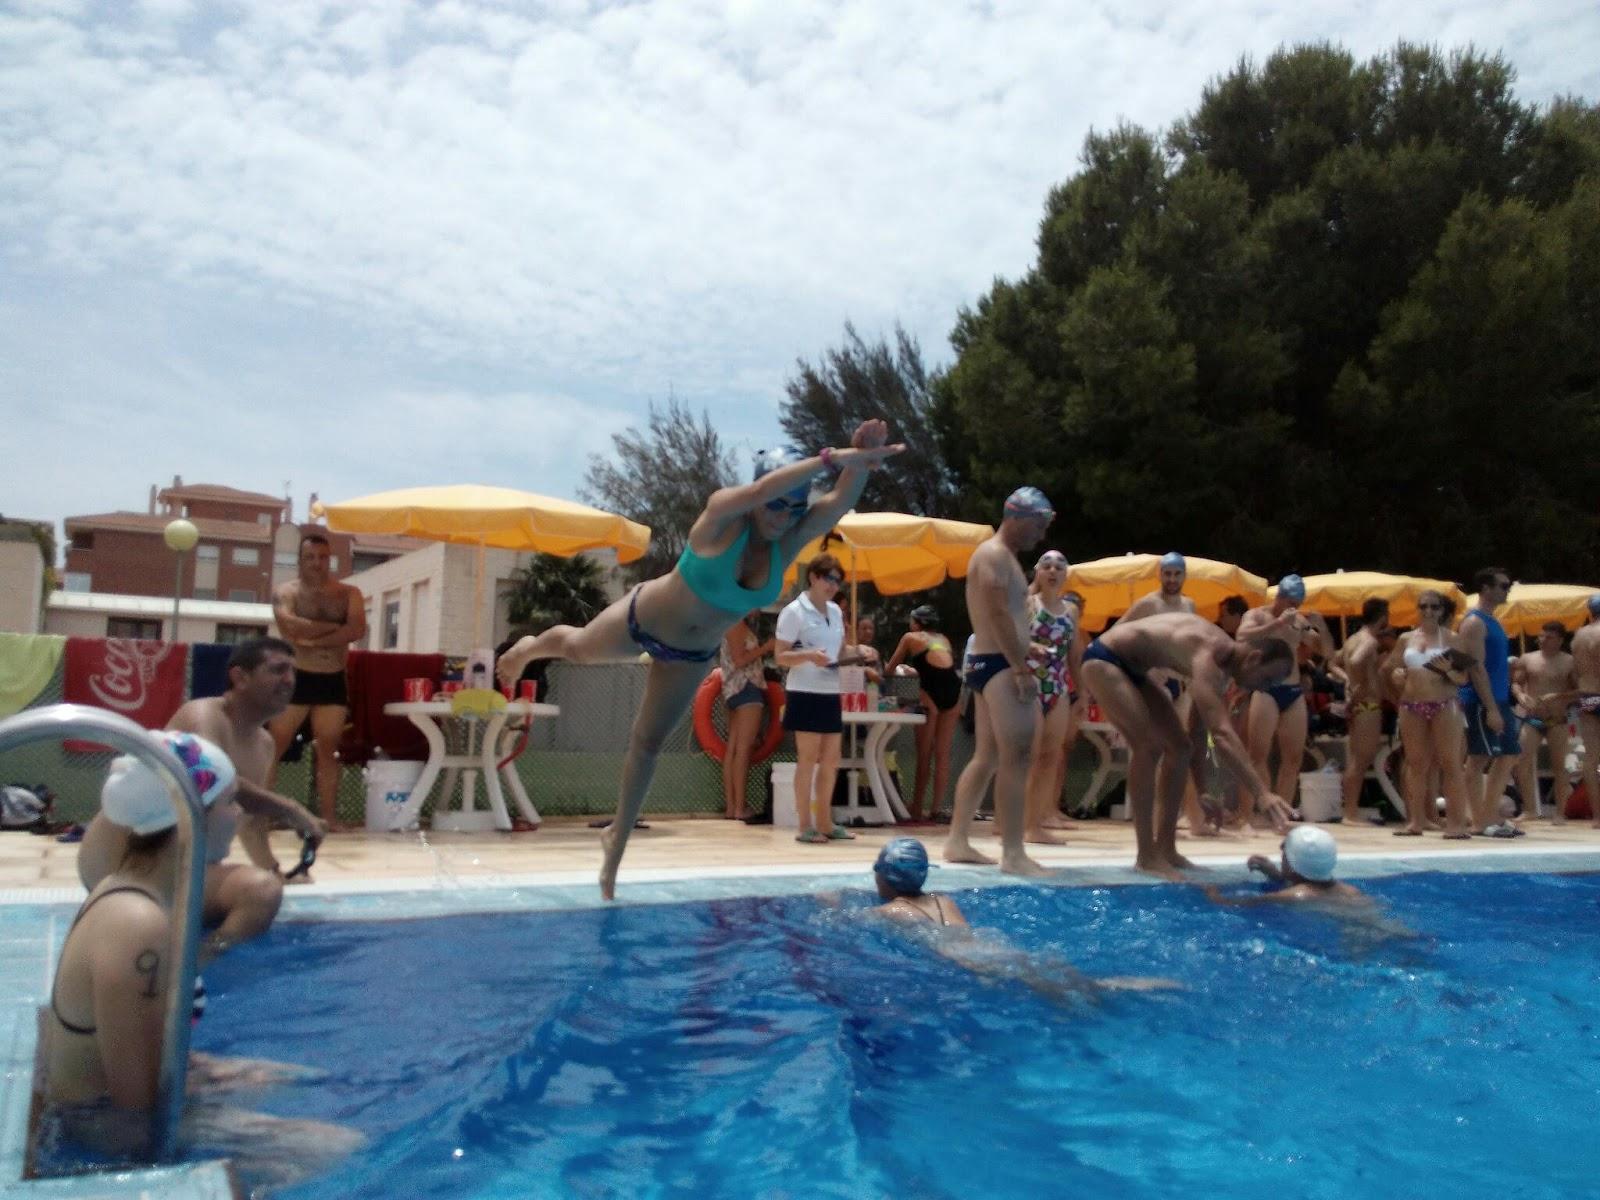 Club atletismo mandarache nataci n por relevos santa ana for Piscina 100 metros portugal